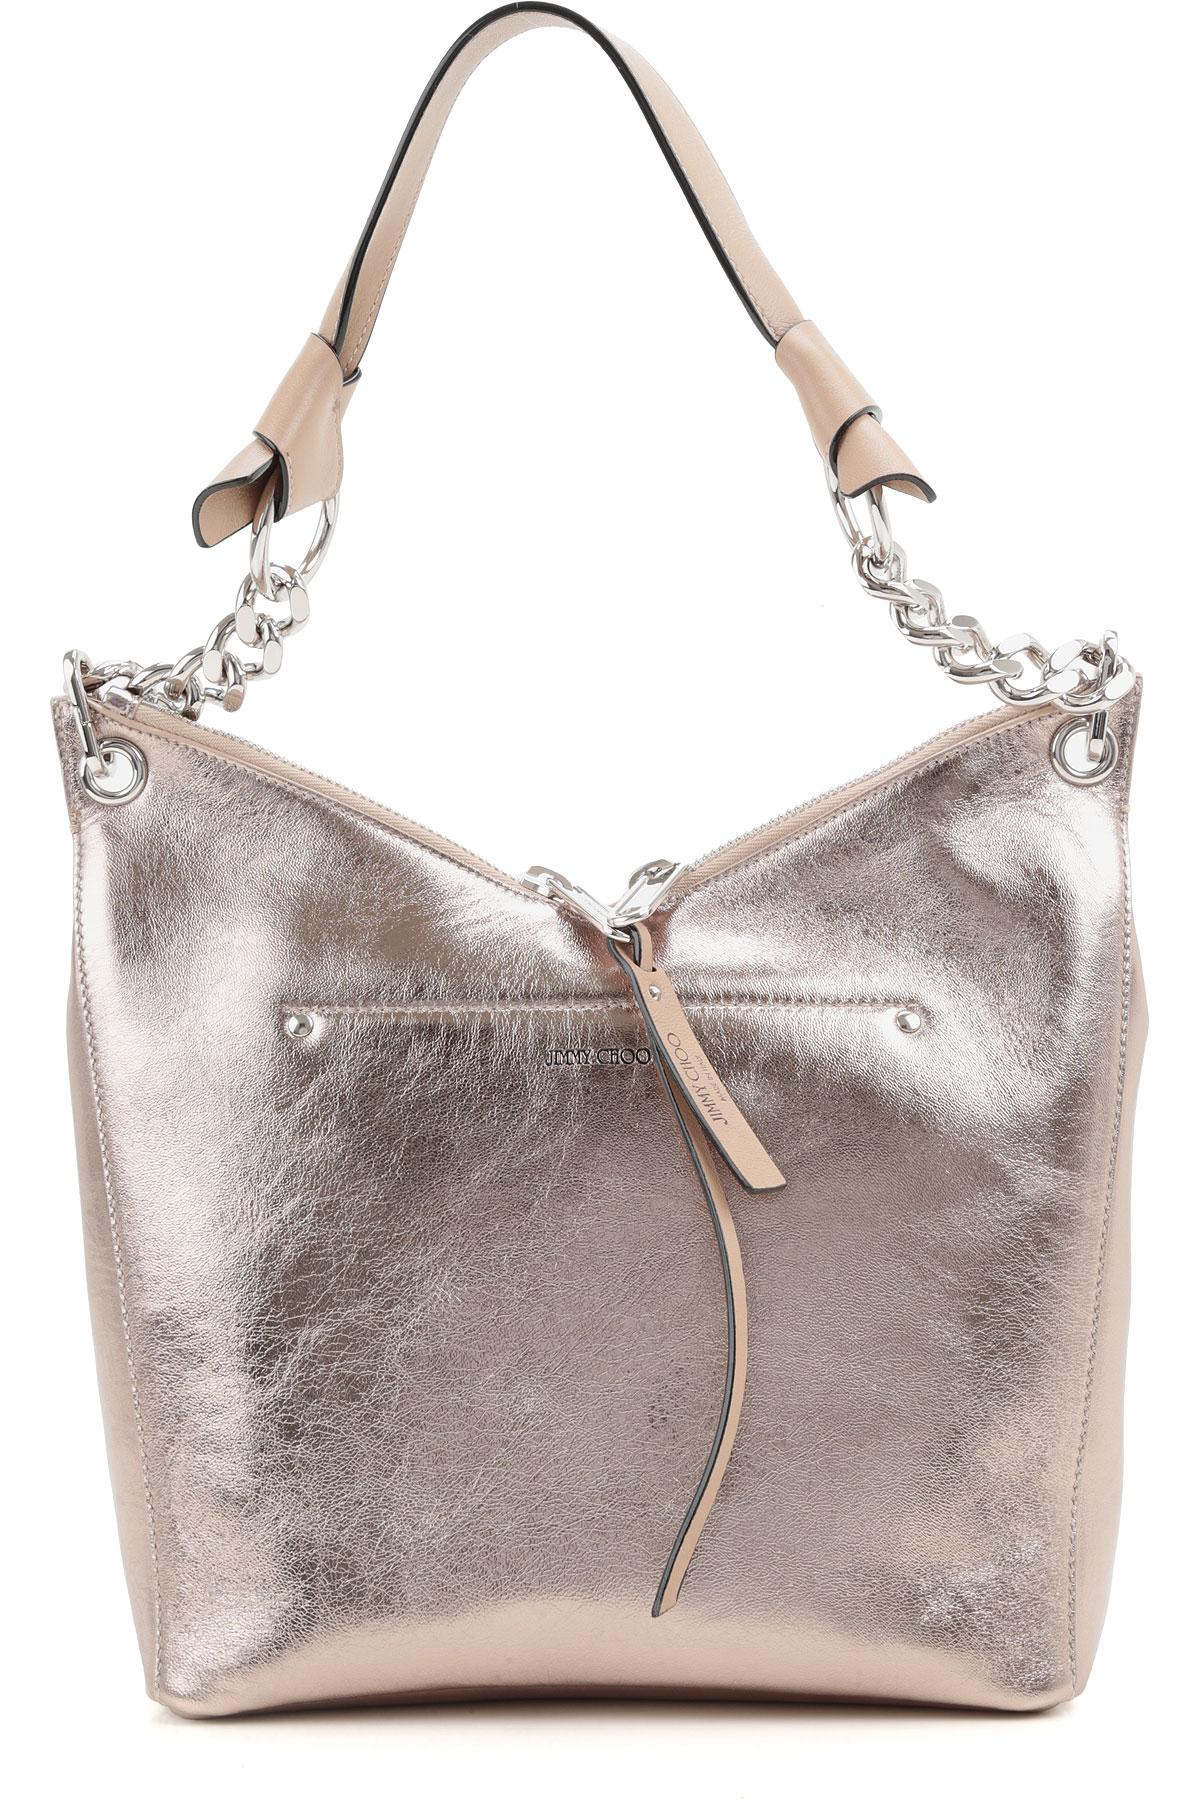 jimmy choo handbags - HD1200×1800